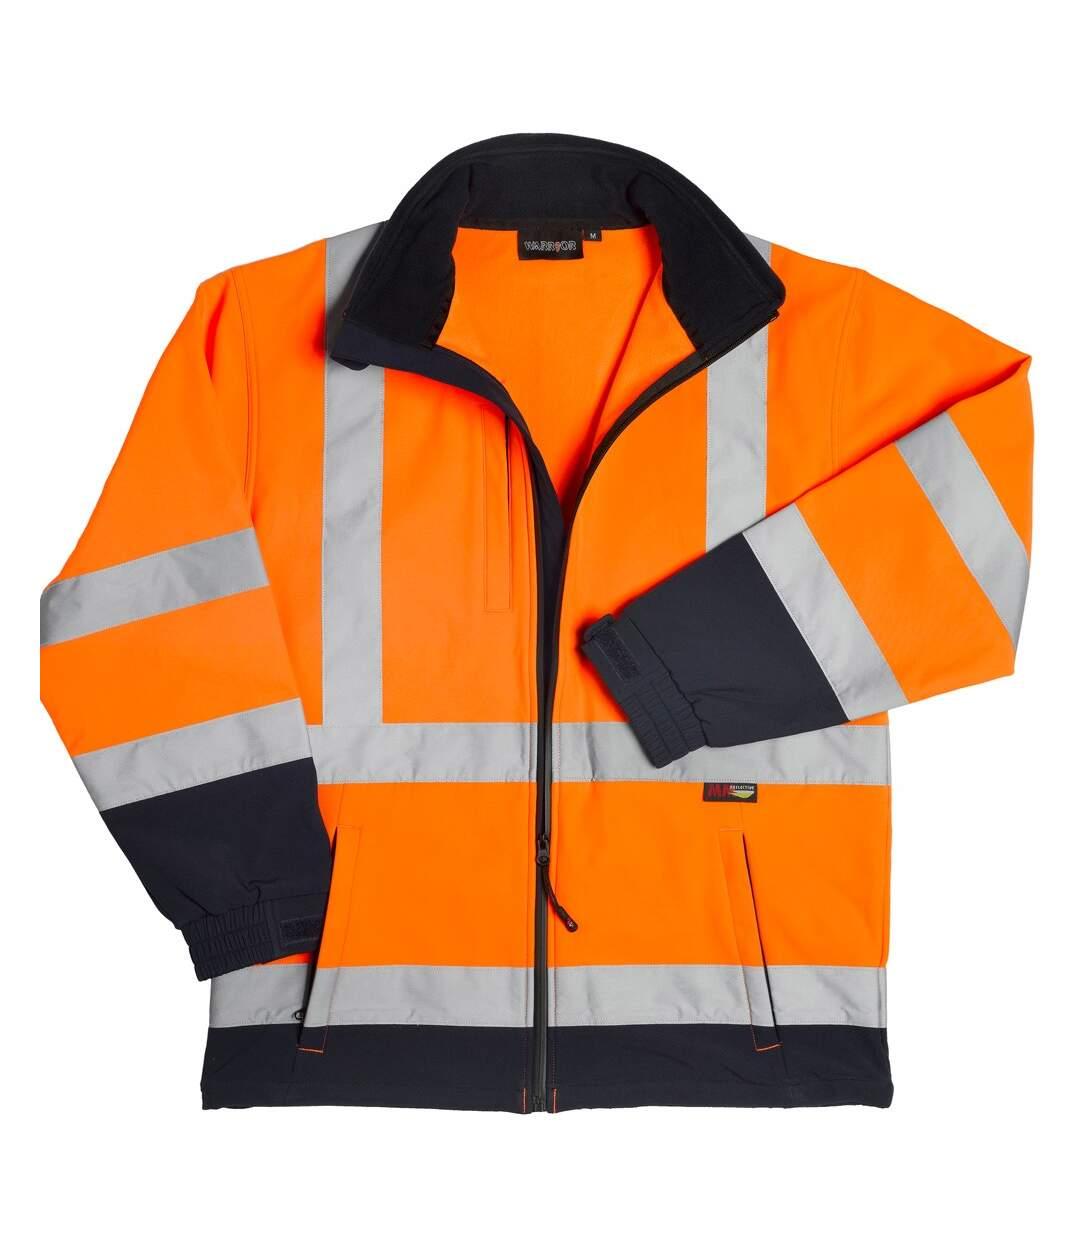 Warrior Mens Iowa Hi-Vis Soft Shell Jacket (Orange/Navy) - UTPC3500